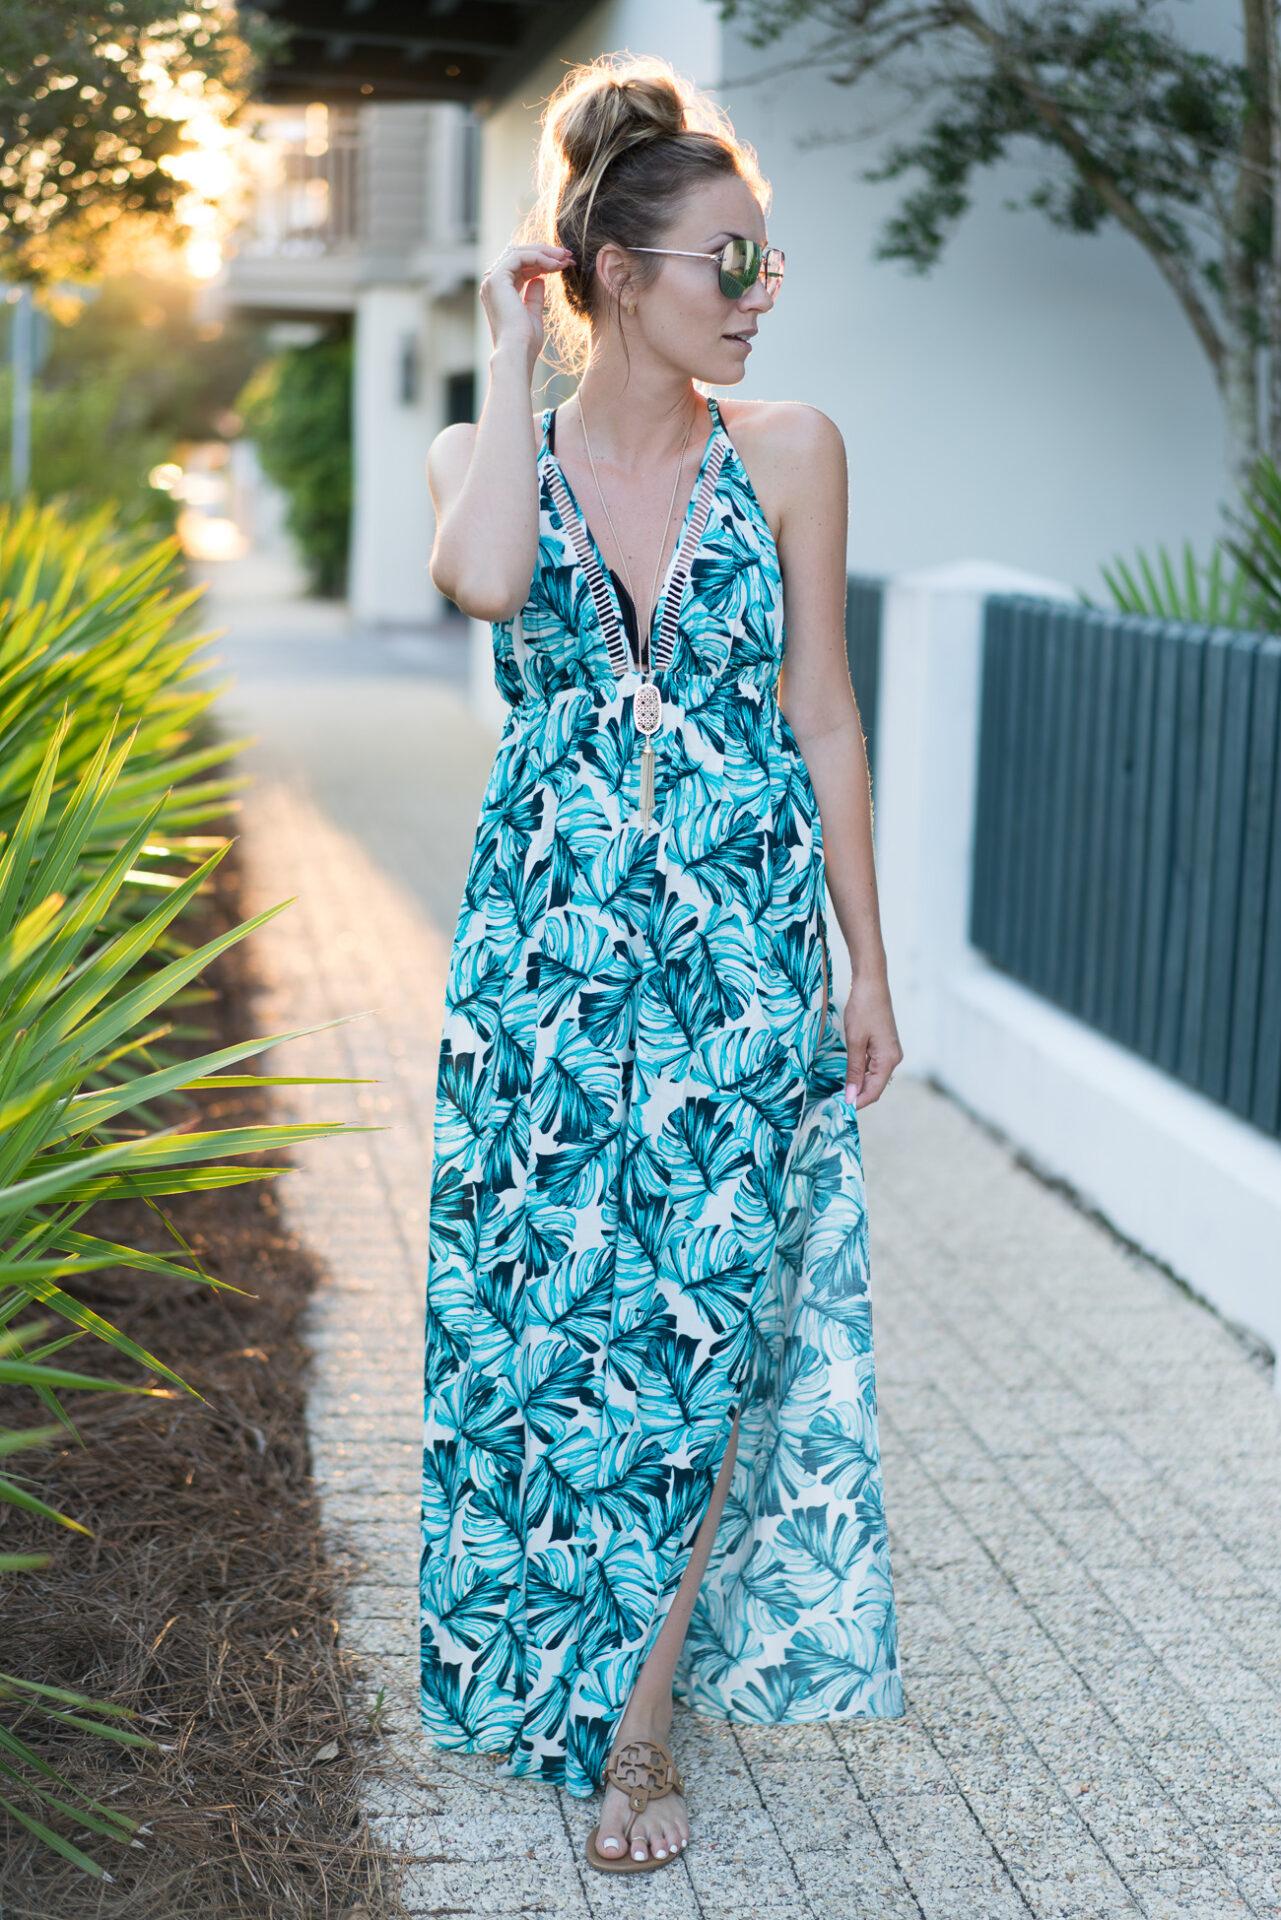 ASOS palm leaf print maxi dress swimsuit cover-up angela lanter hello gorgeous